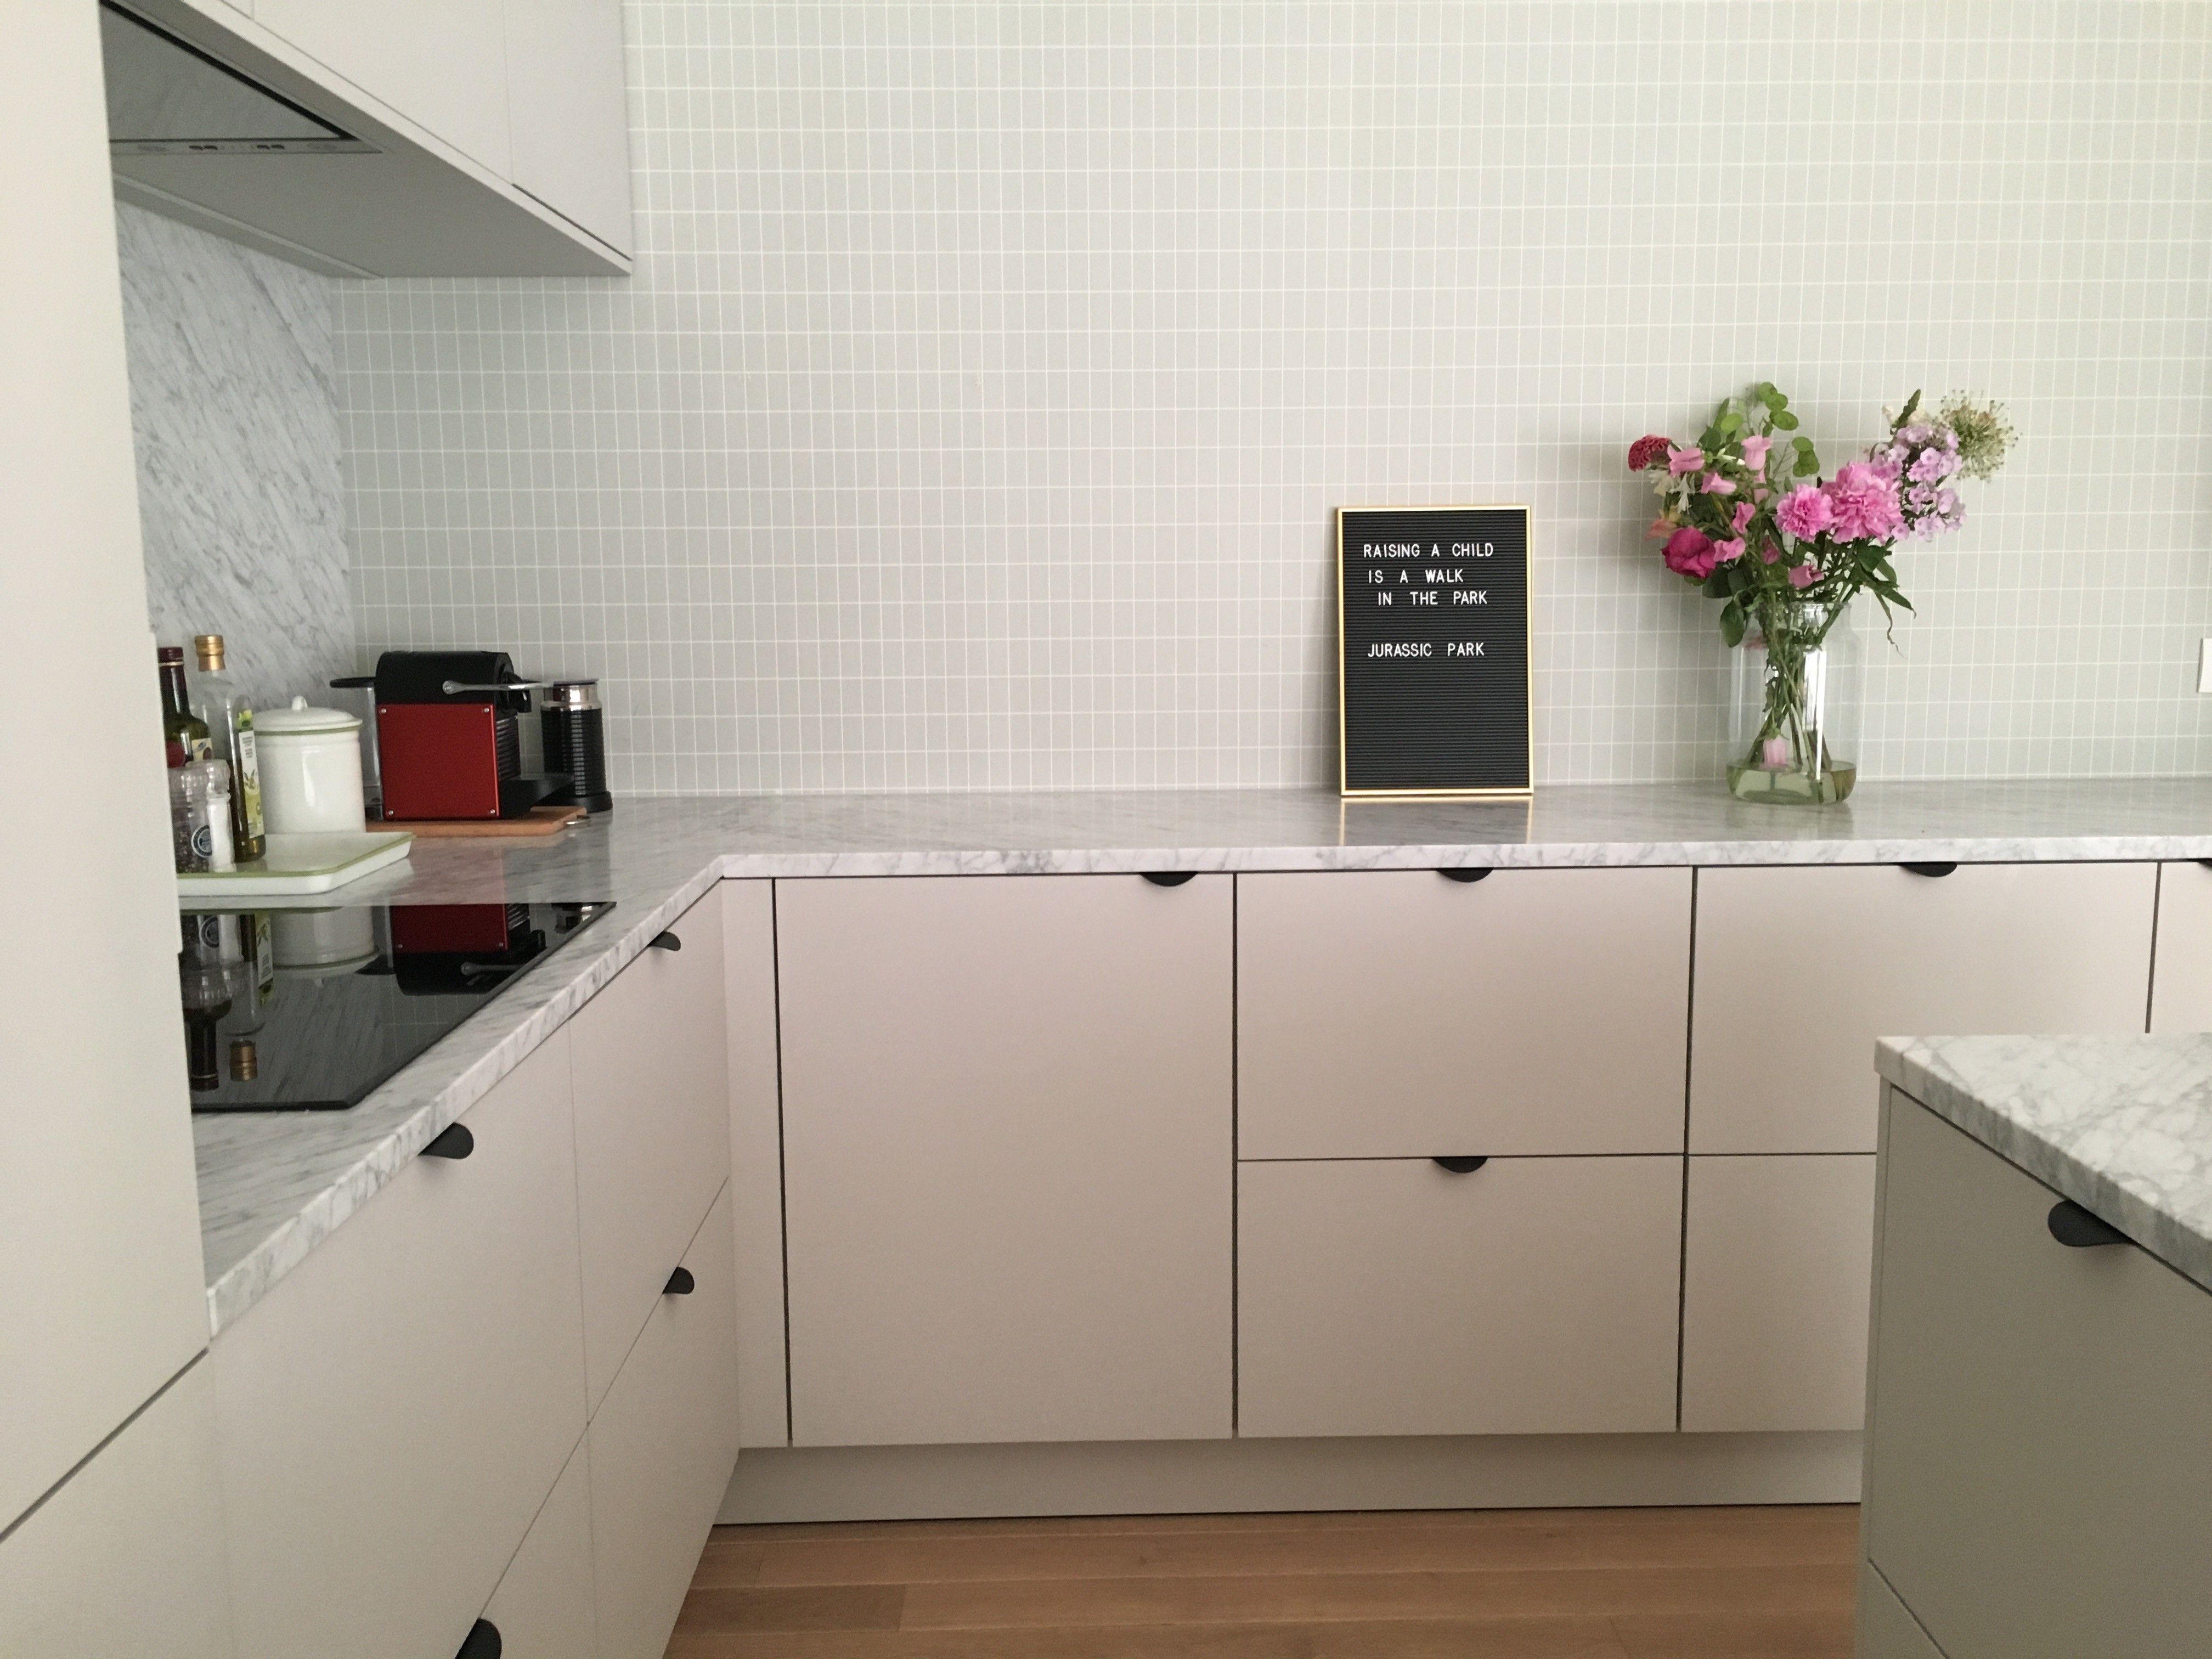 Siematic Keukens Utrecht : Siematic pure kitchen keuken❤ keuken